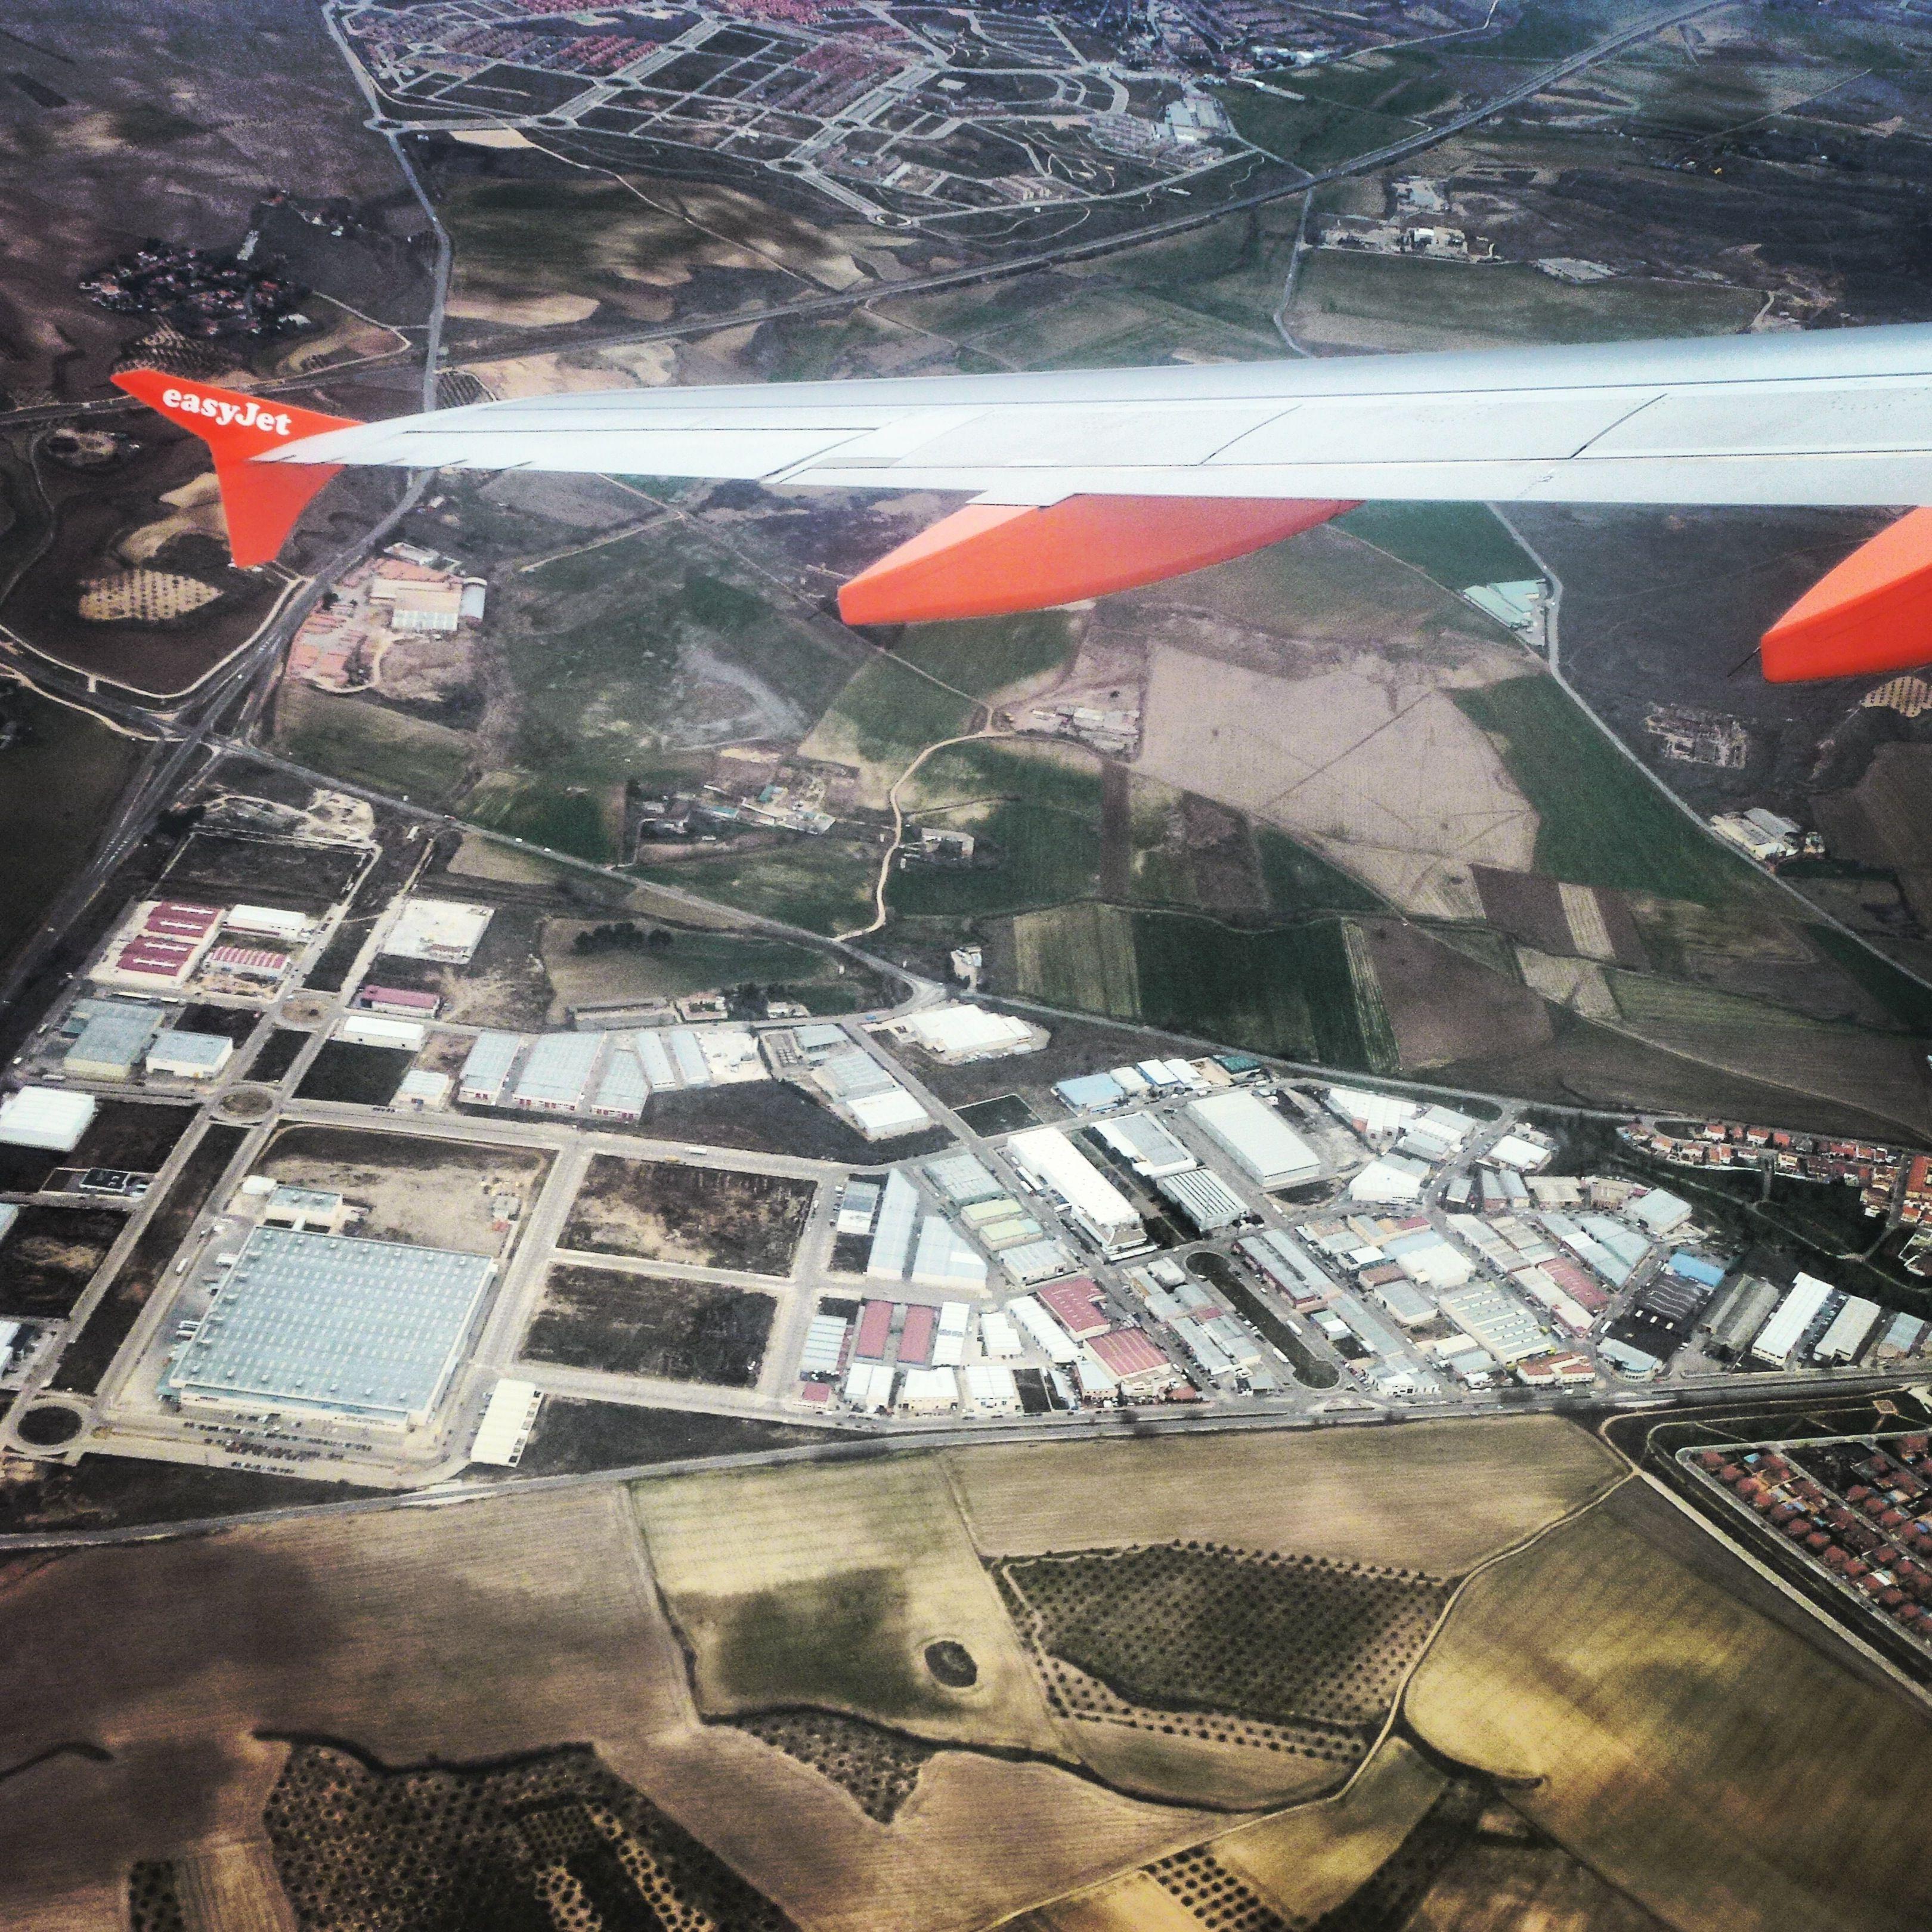 Hoy viaje de altos vuelos #recuerdo # vistaaérea #panoramica #próximo destino Milán #nosvemosenlastiendas #fly #volar #aircaft #easyjet